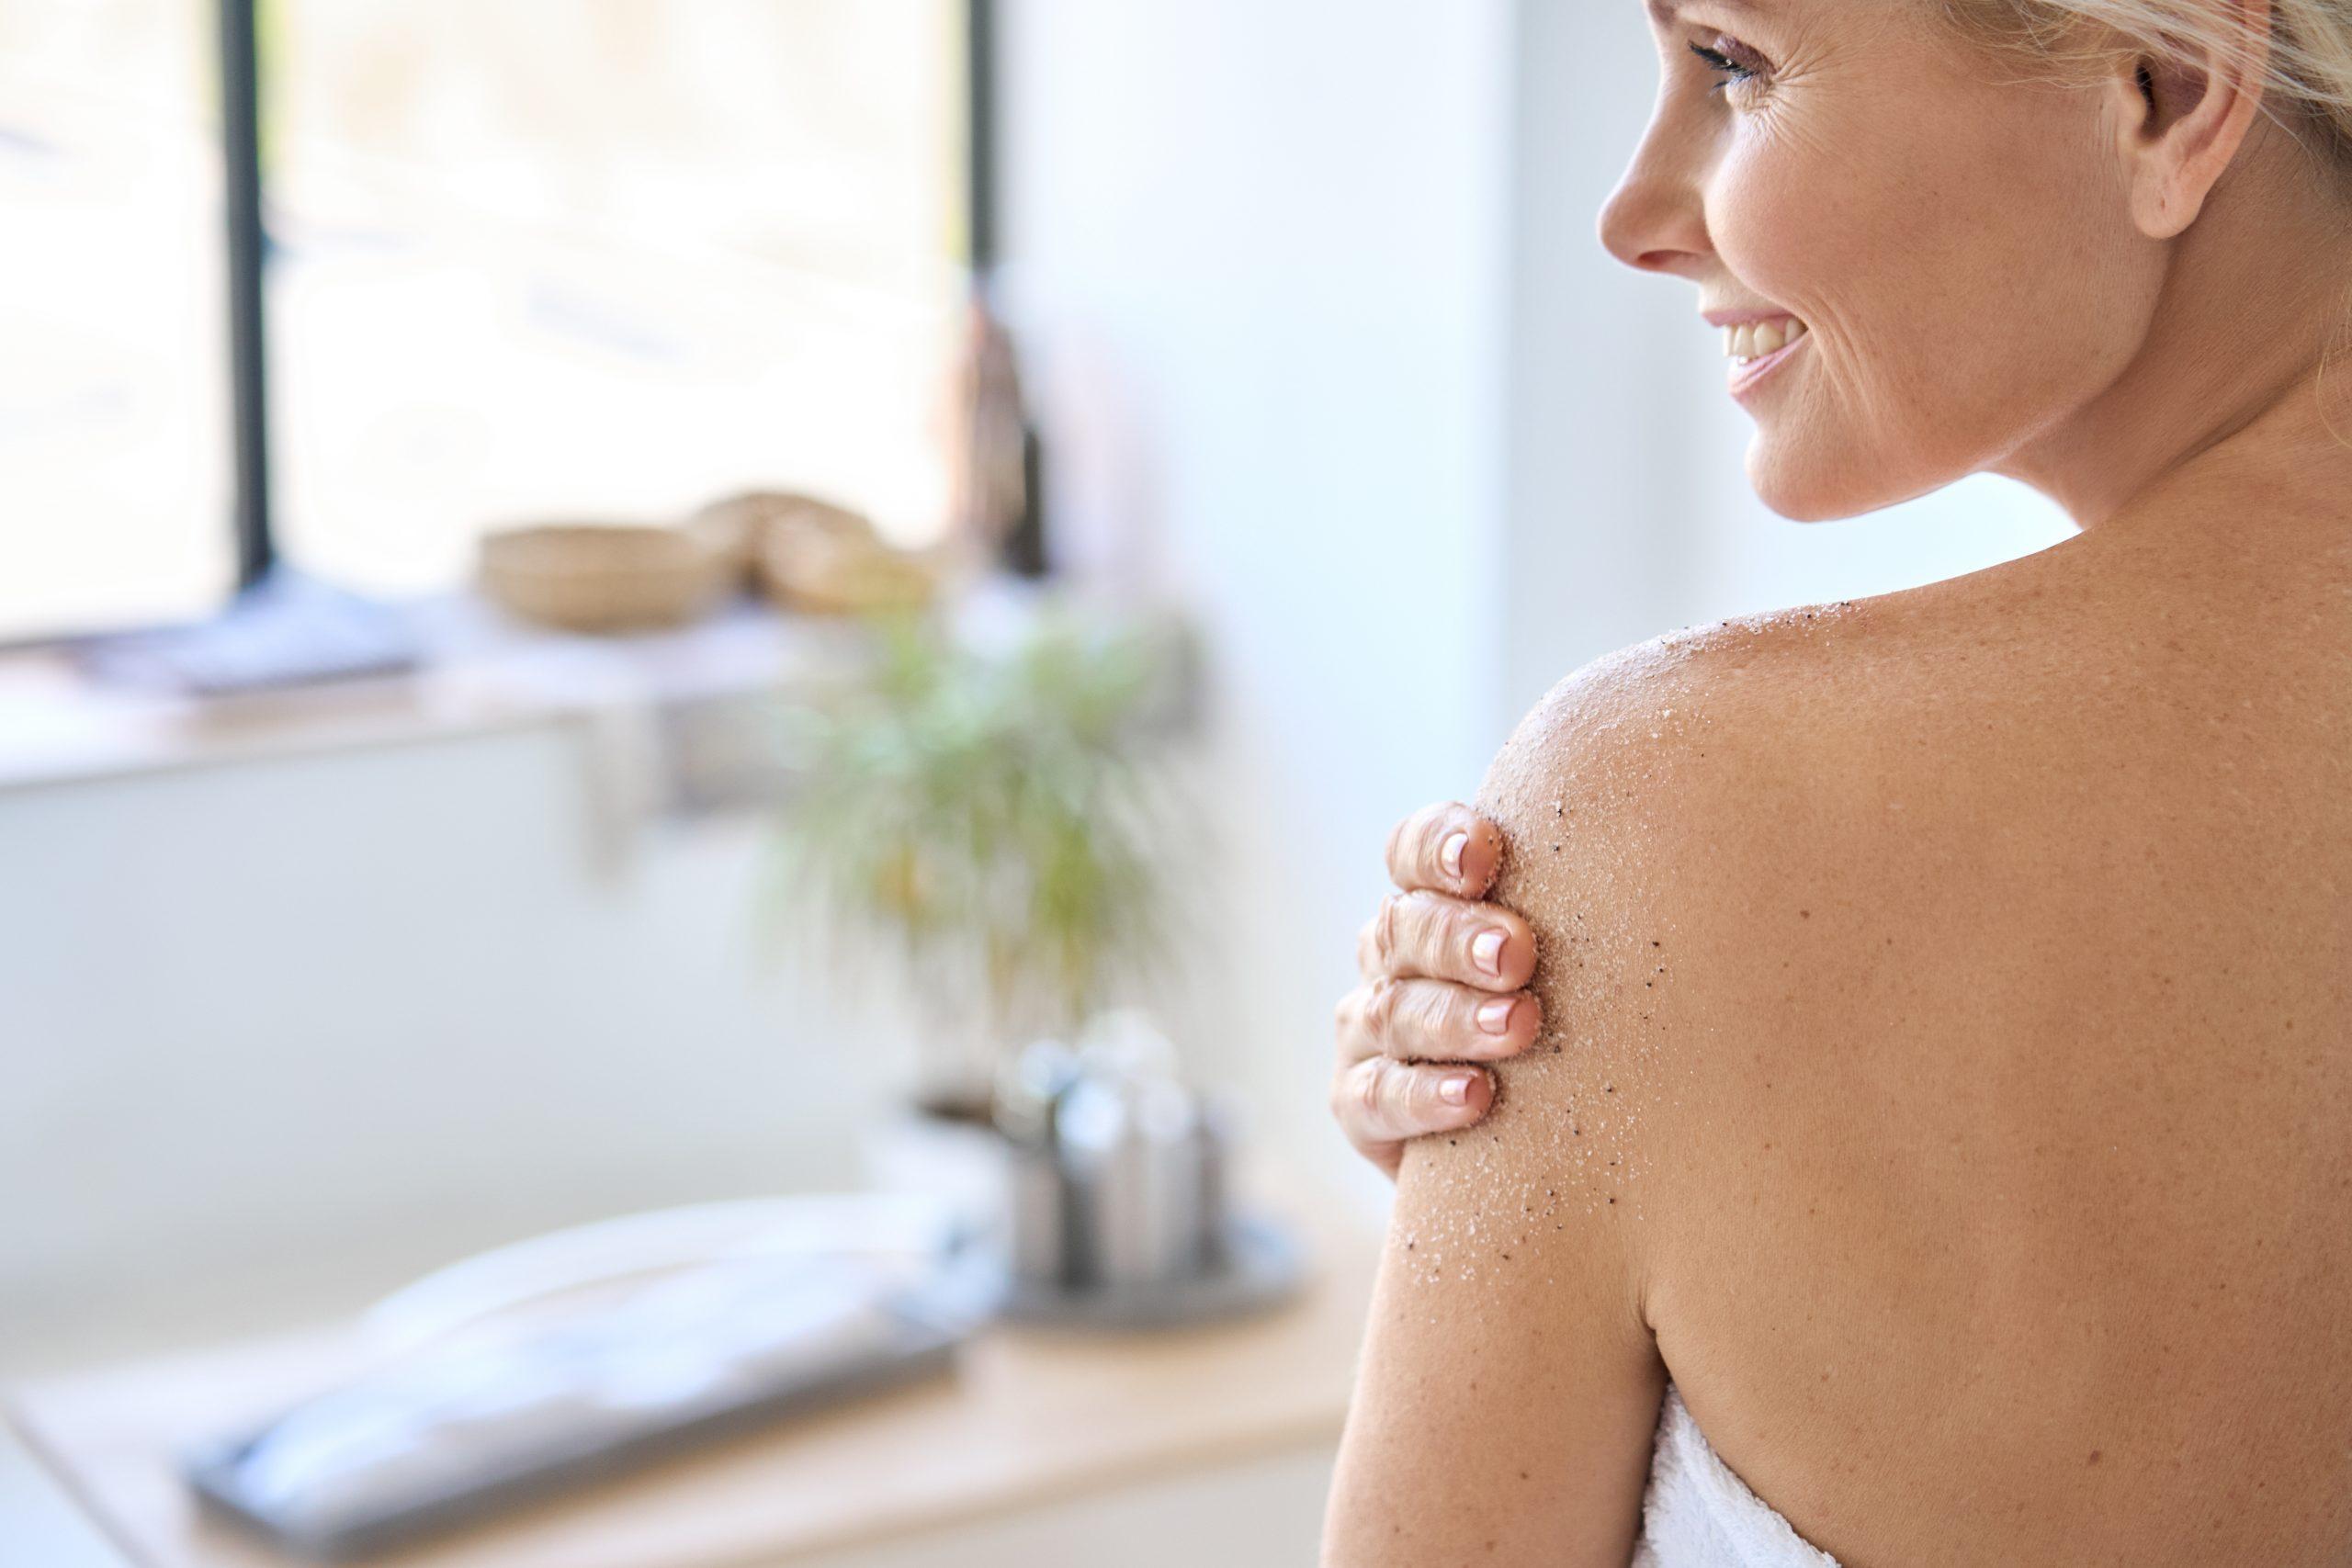 Back view of mid age woman applying body scrub